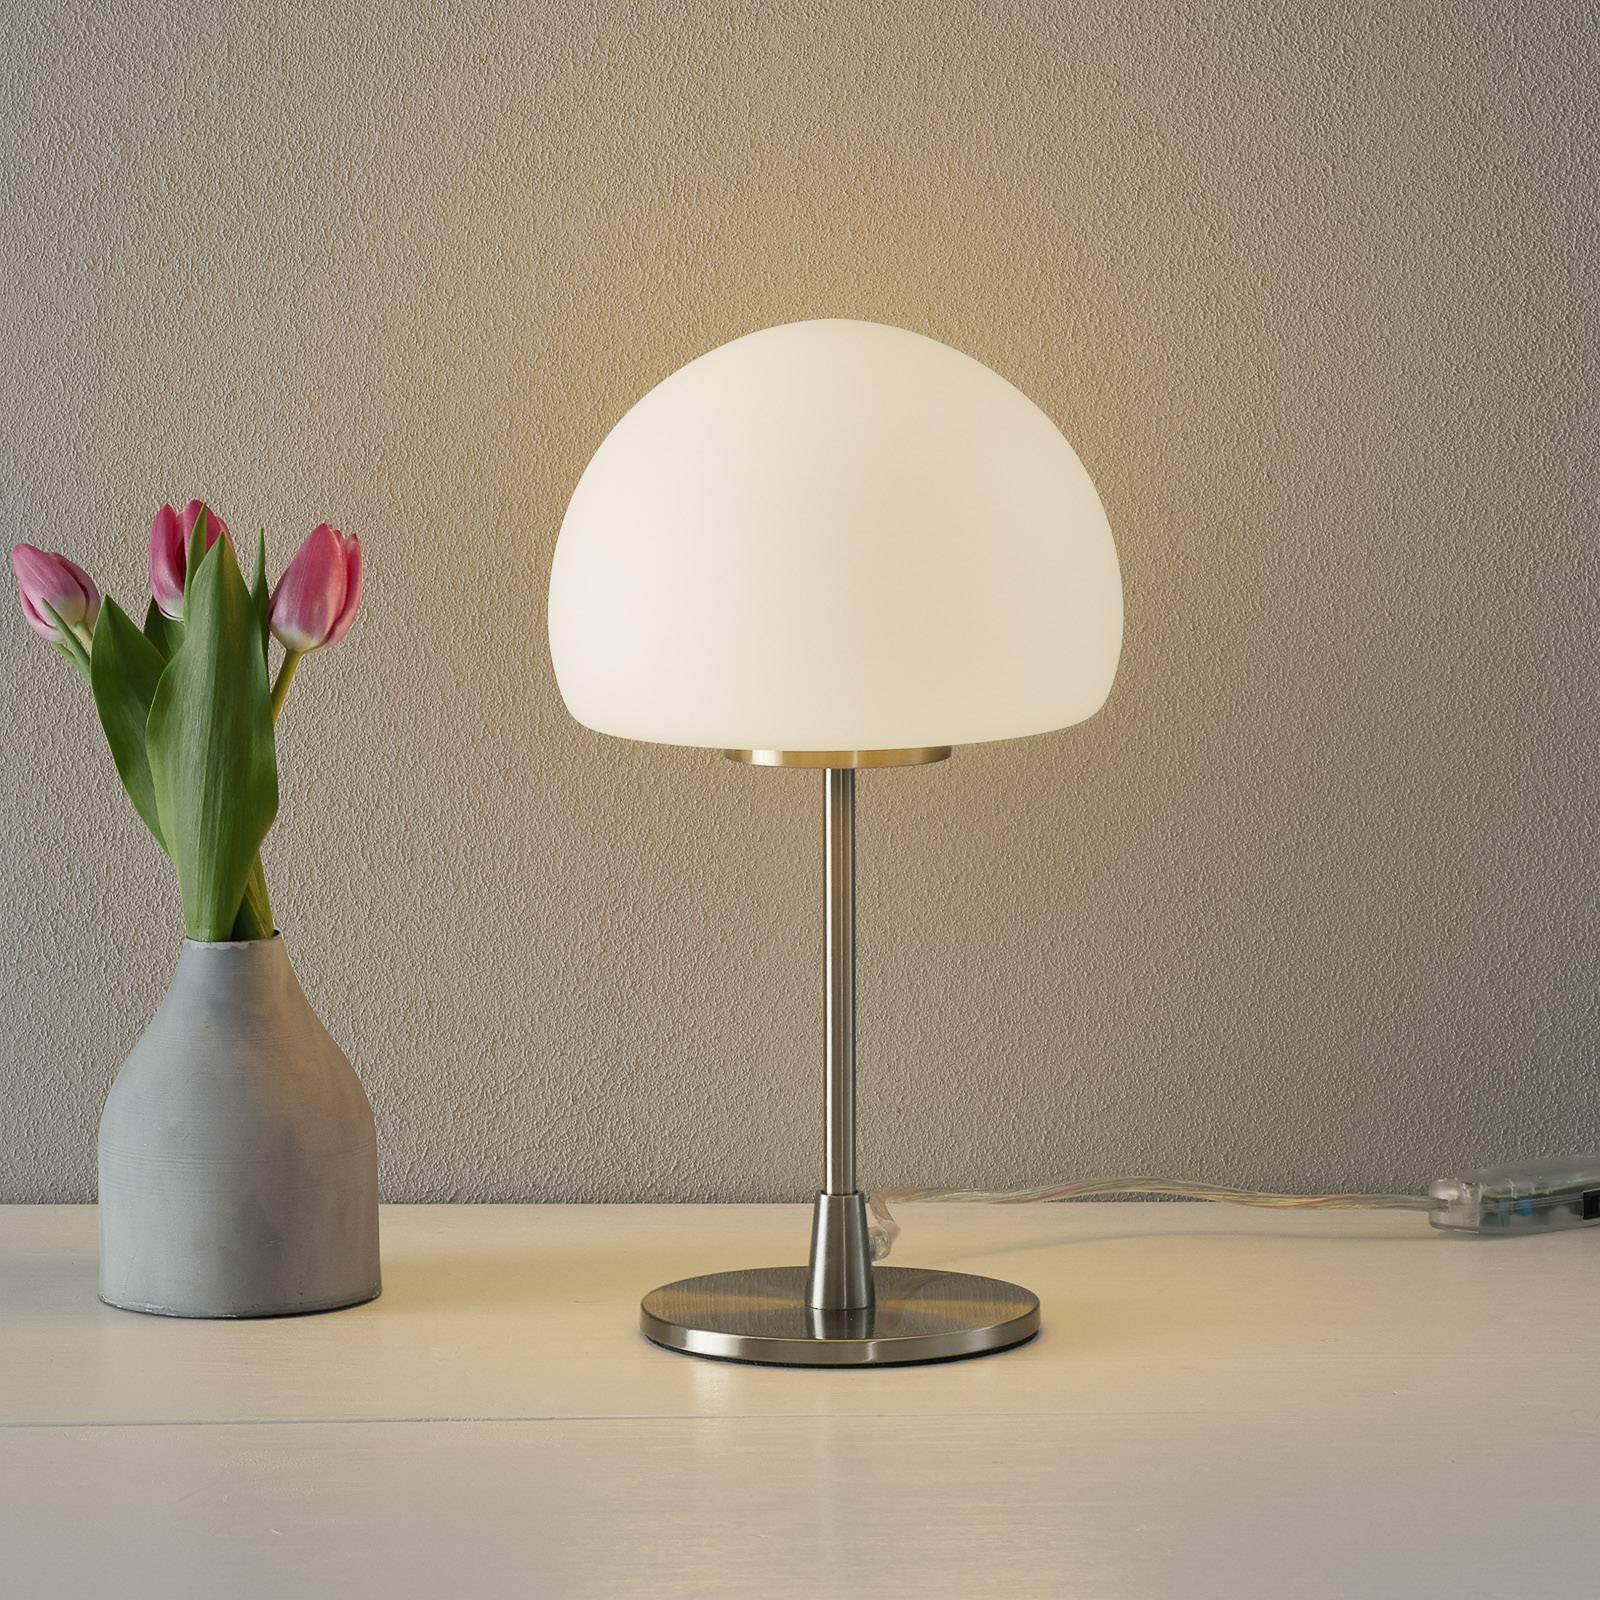 Bordlampe Gaia Big med berøringsfunksjon, hvit